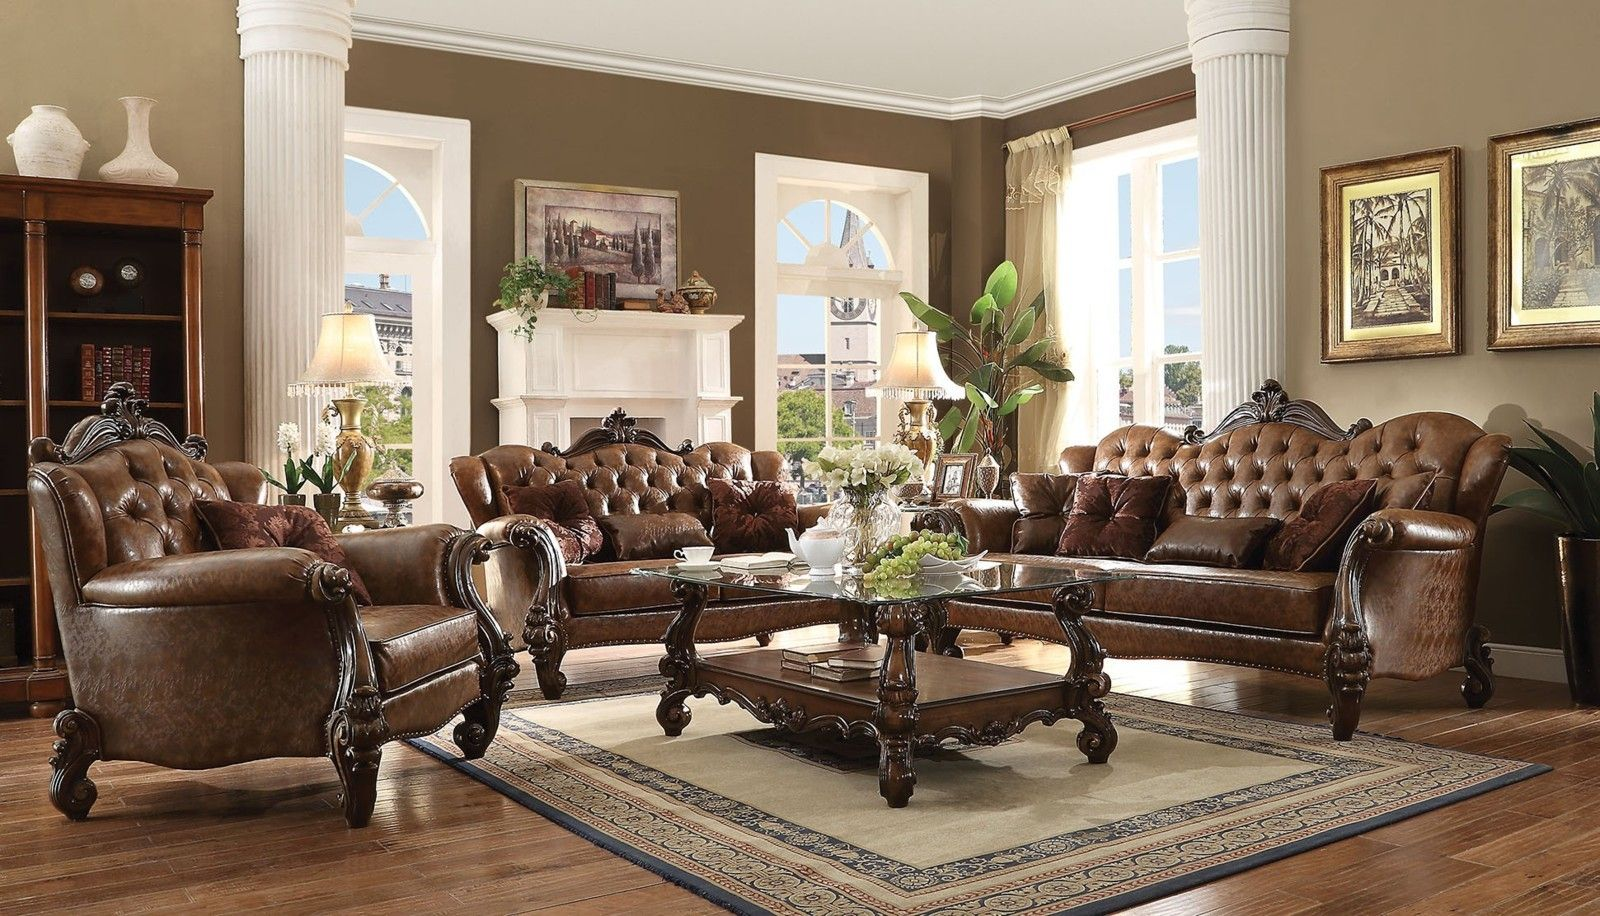 Best Acme Versailles 2 Piece Living Room Set In L Brown Pu 400 x 300